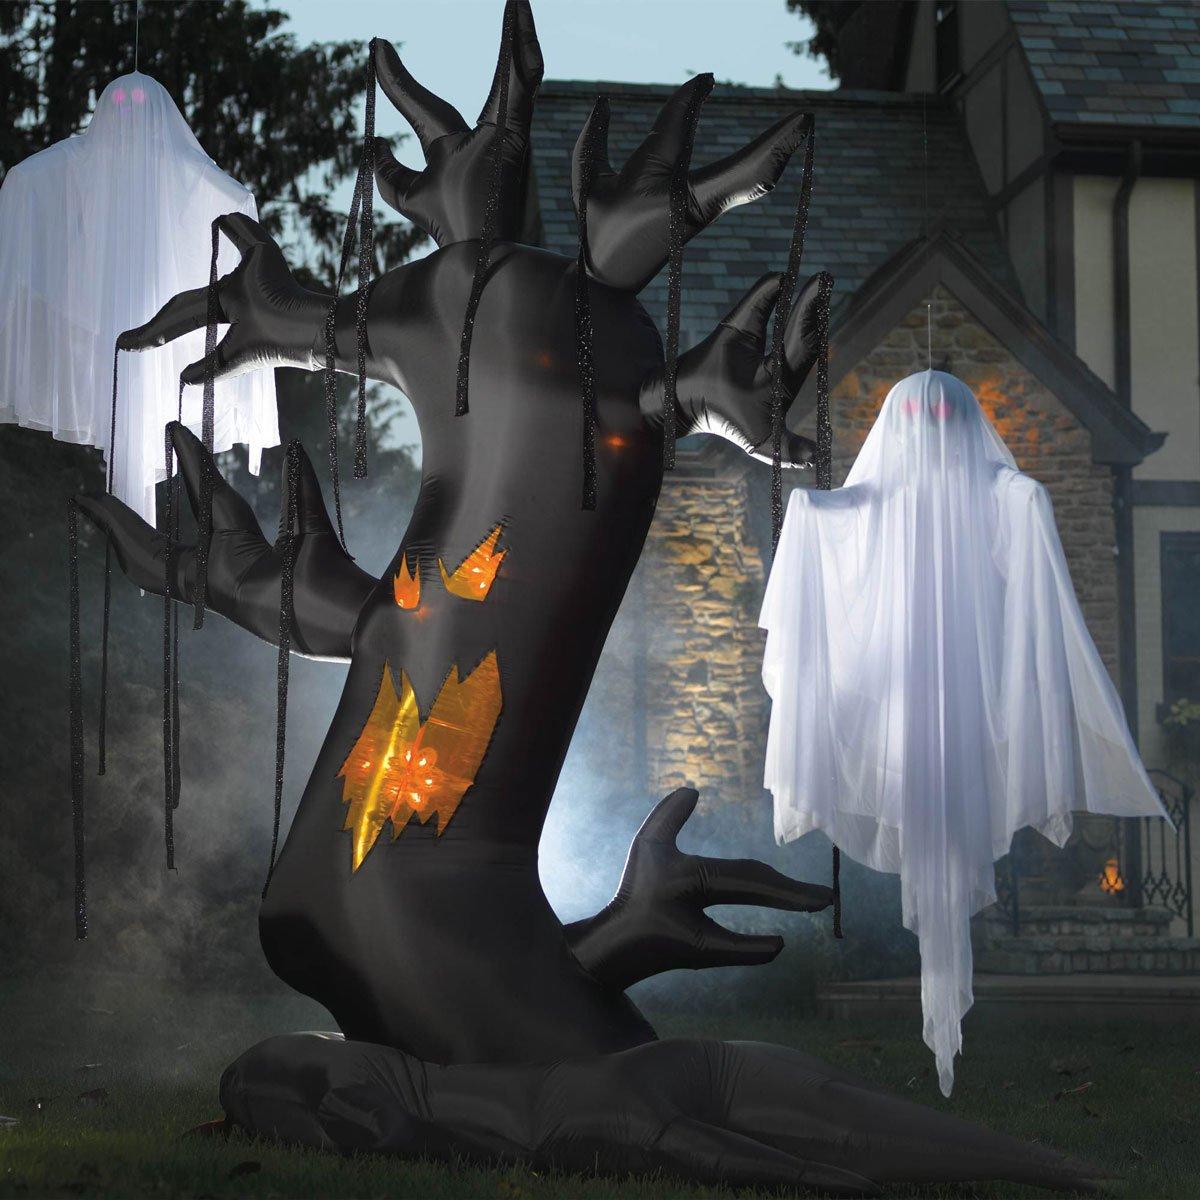 Spooky halloween tree decoration - Giant Inflatable Spooky Tree